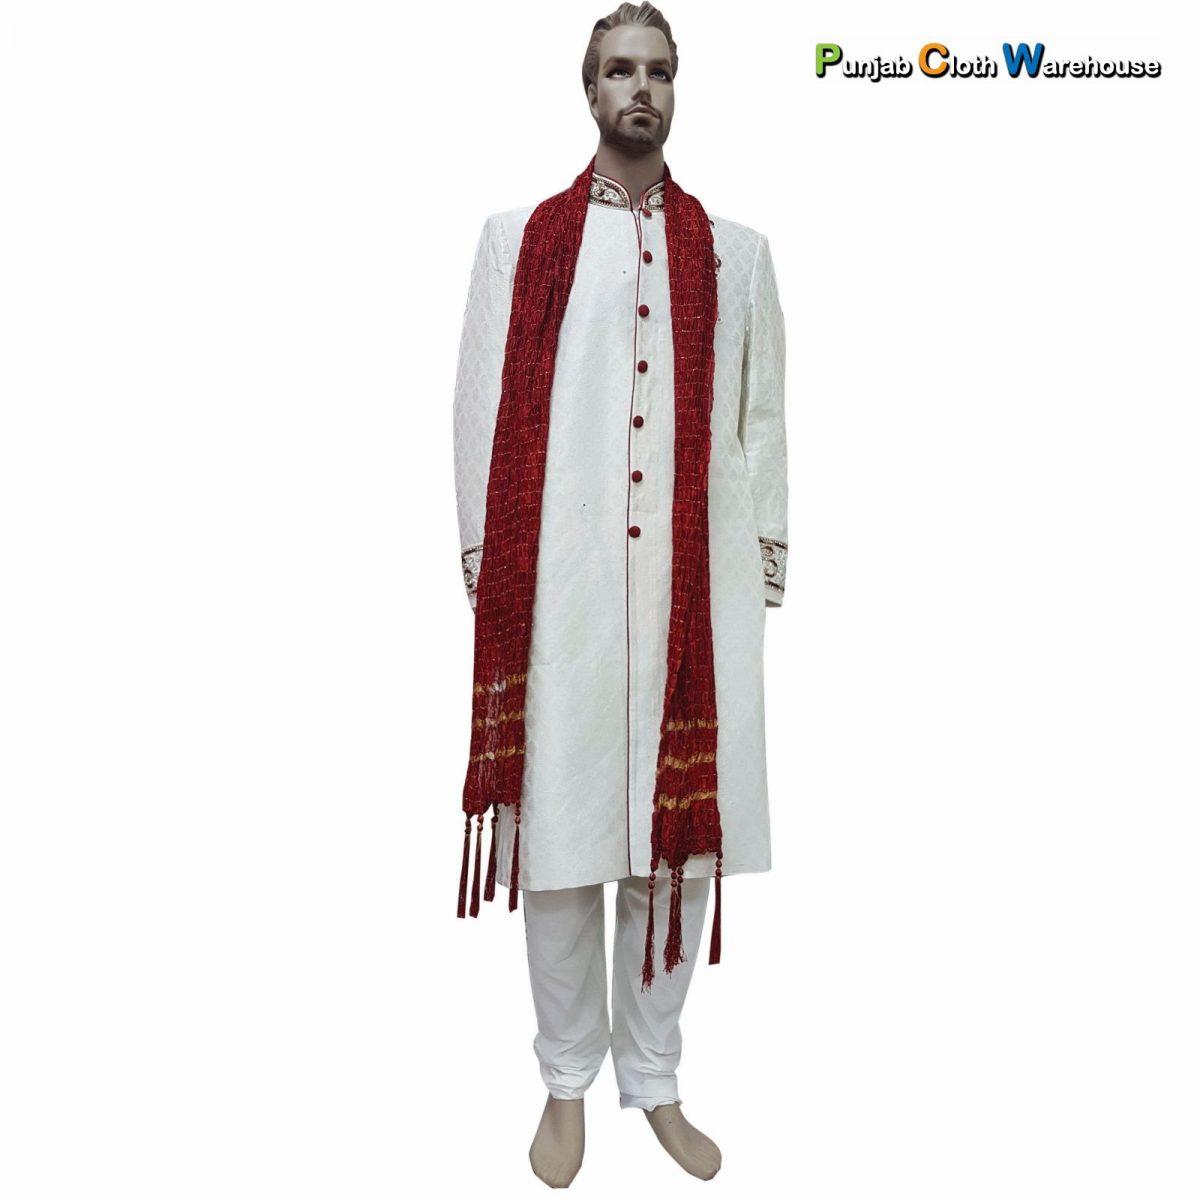 Designer Party Wear Suits, Sarees, Lehengas & Sherwanis (39)